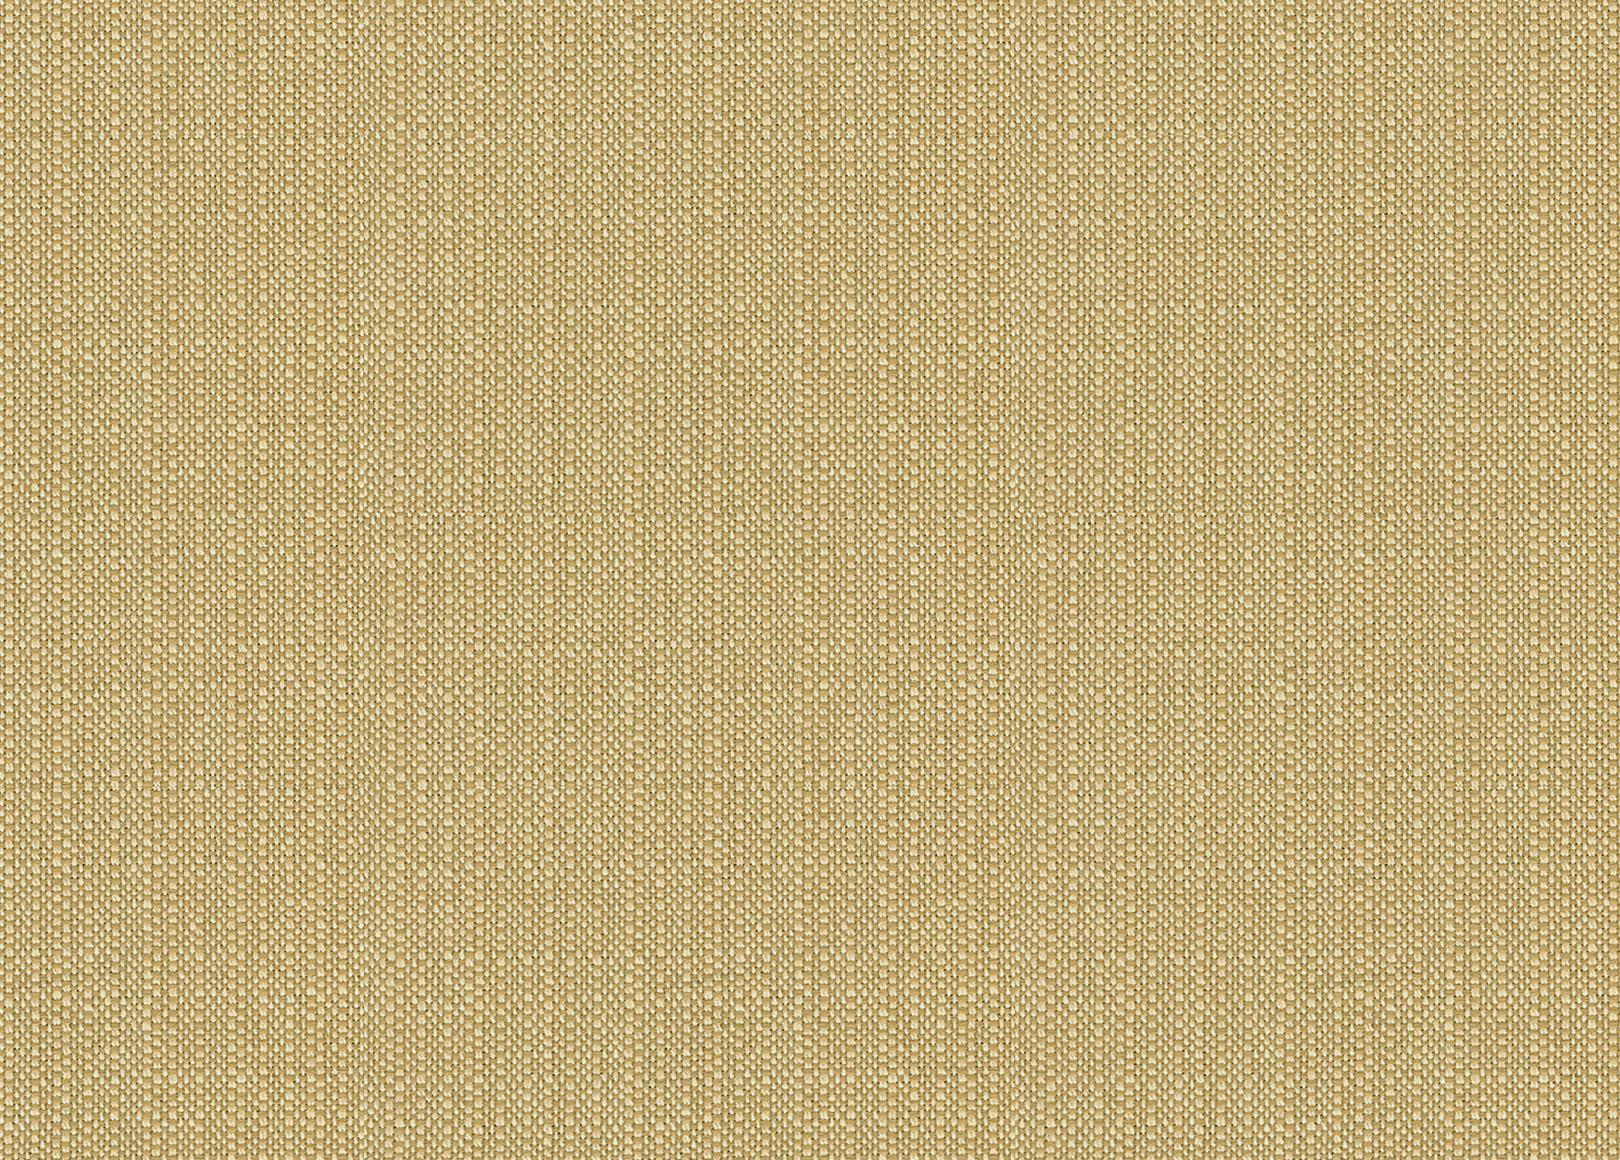 Cayman Grain Fabric Fabrics Ethan Allen